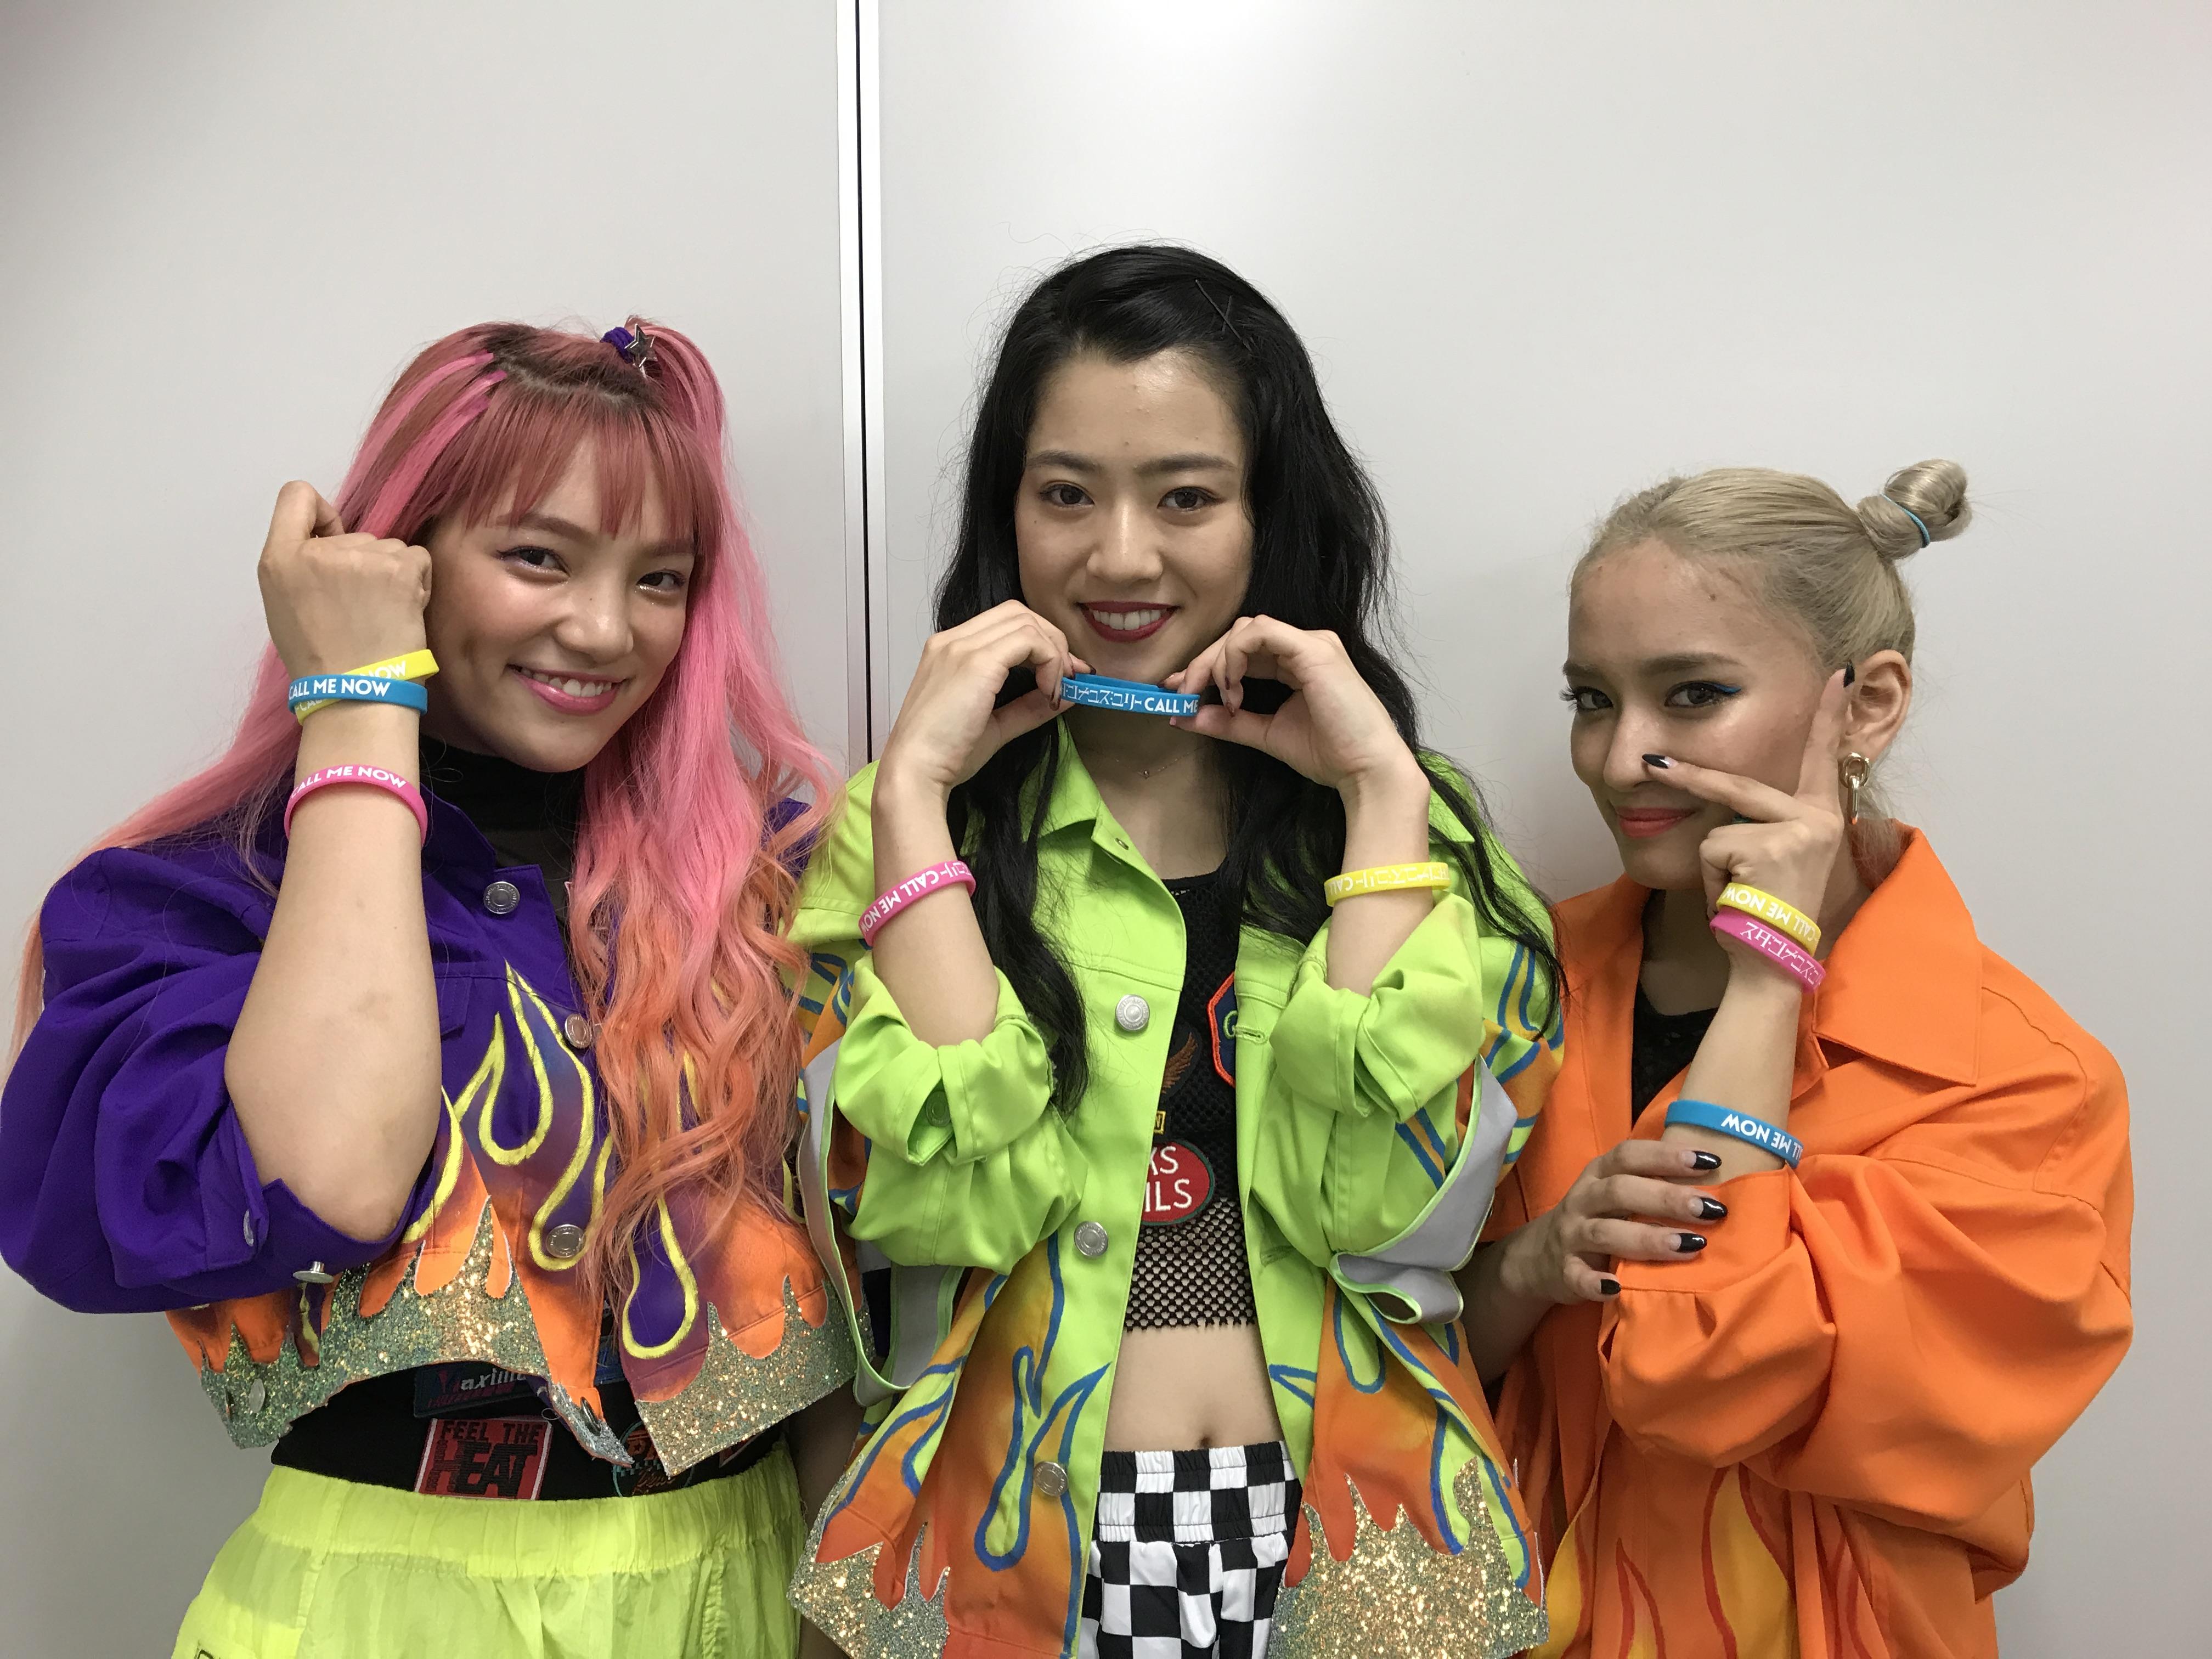 E-girlsメンバーで結成のHIP HOPユニット・スダンナユズユリーの巨大ビジュアルが原宿に出現